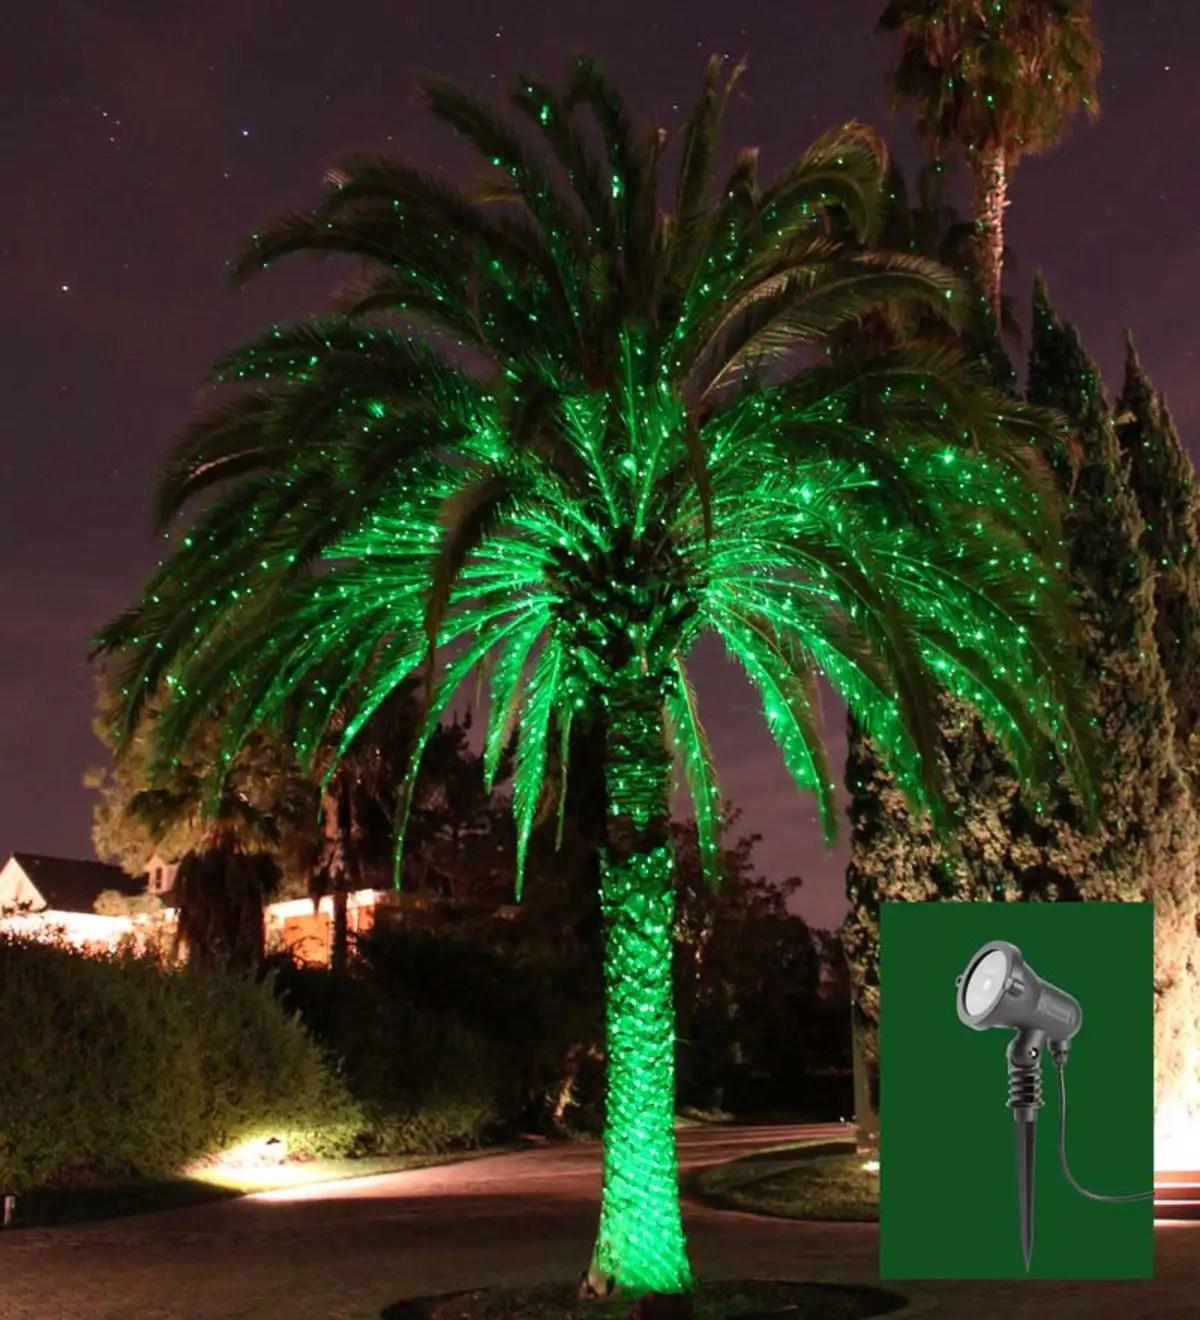 usa made firefly decorative landscape lighting